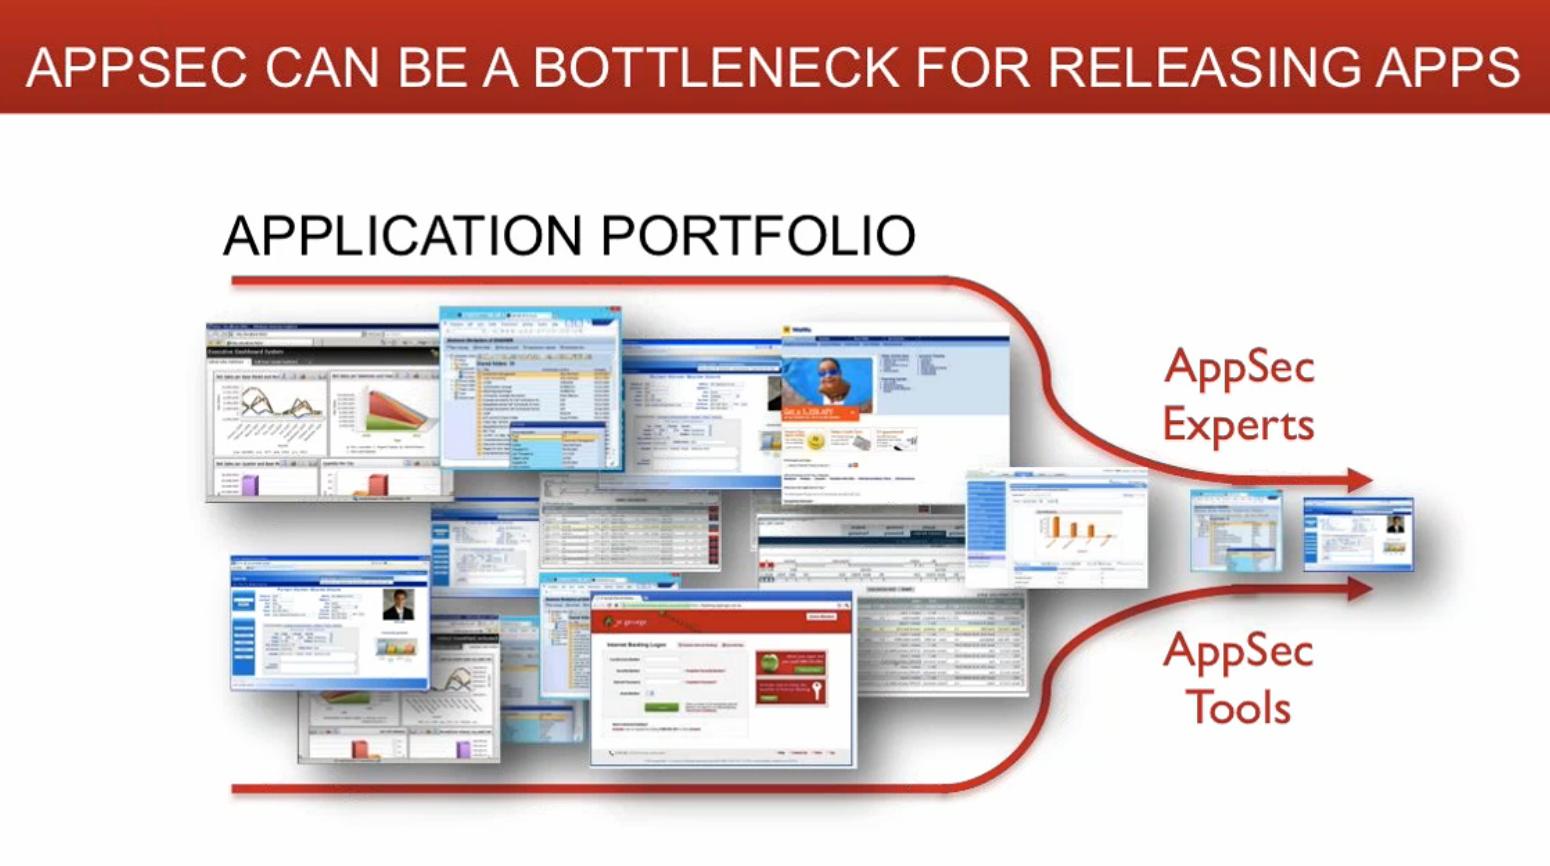 BottleNeck-appsecurity.png